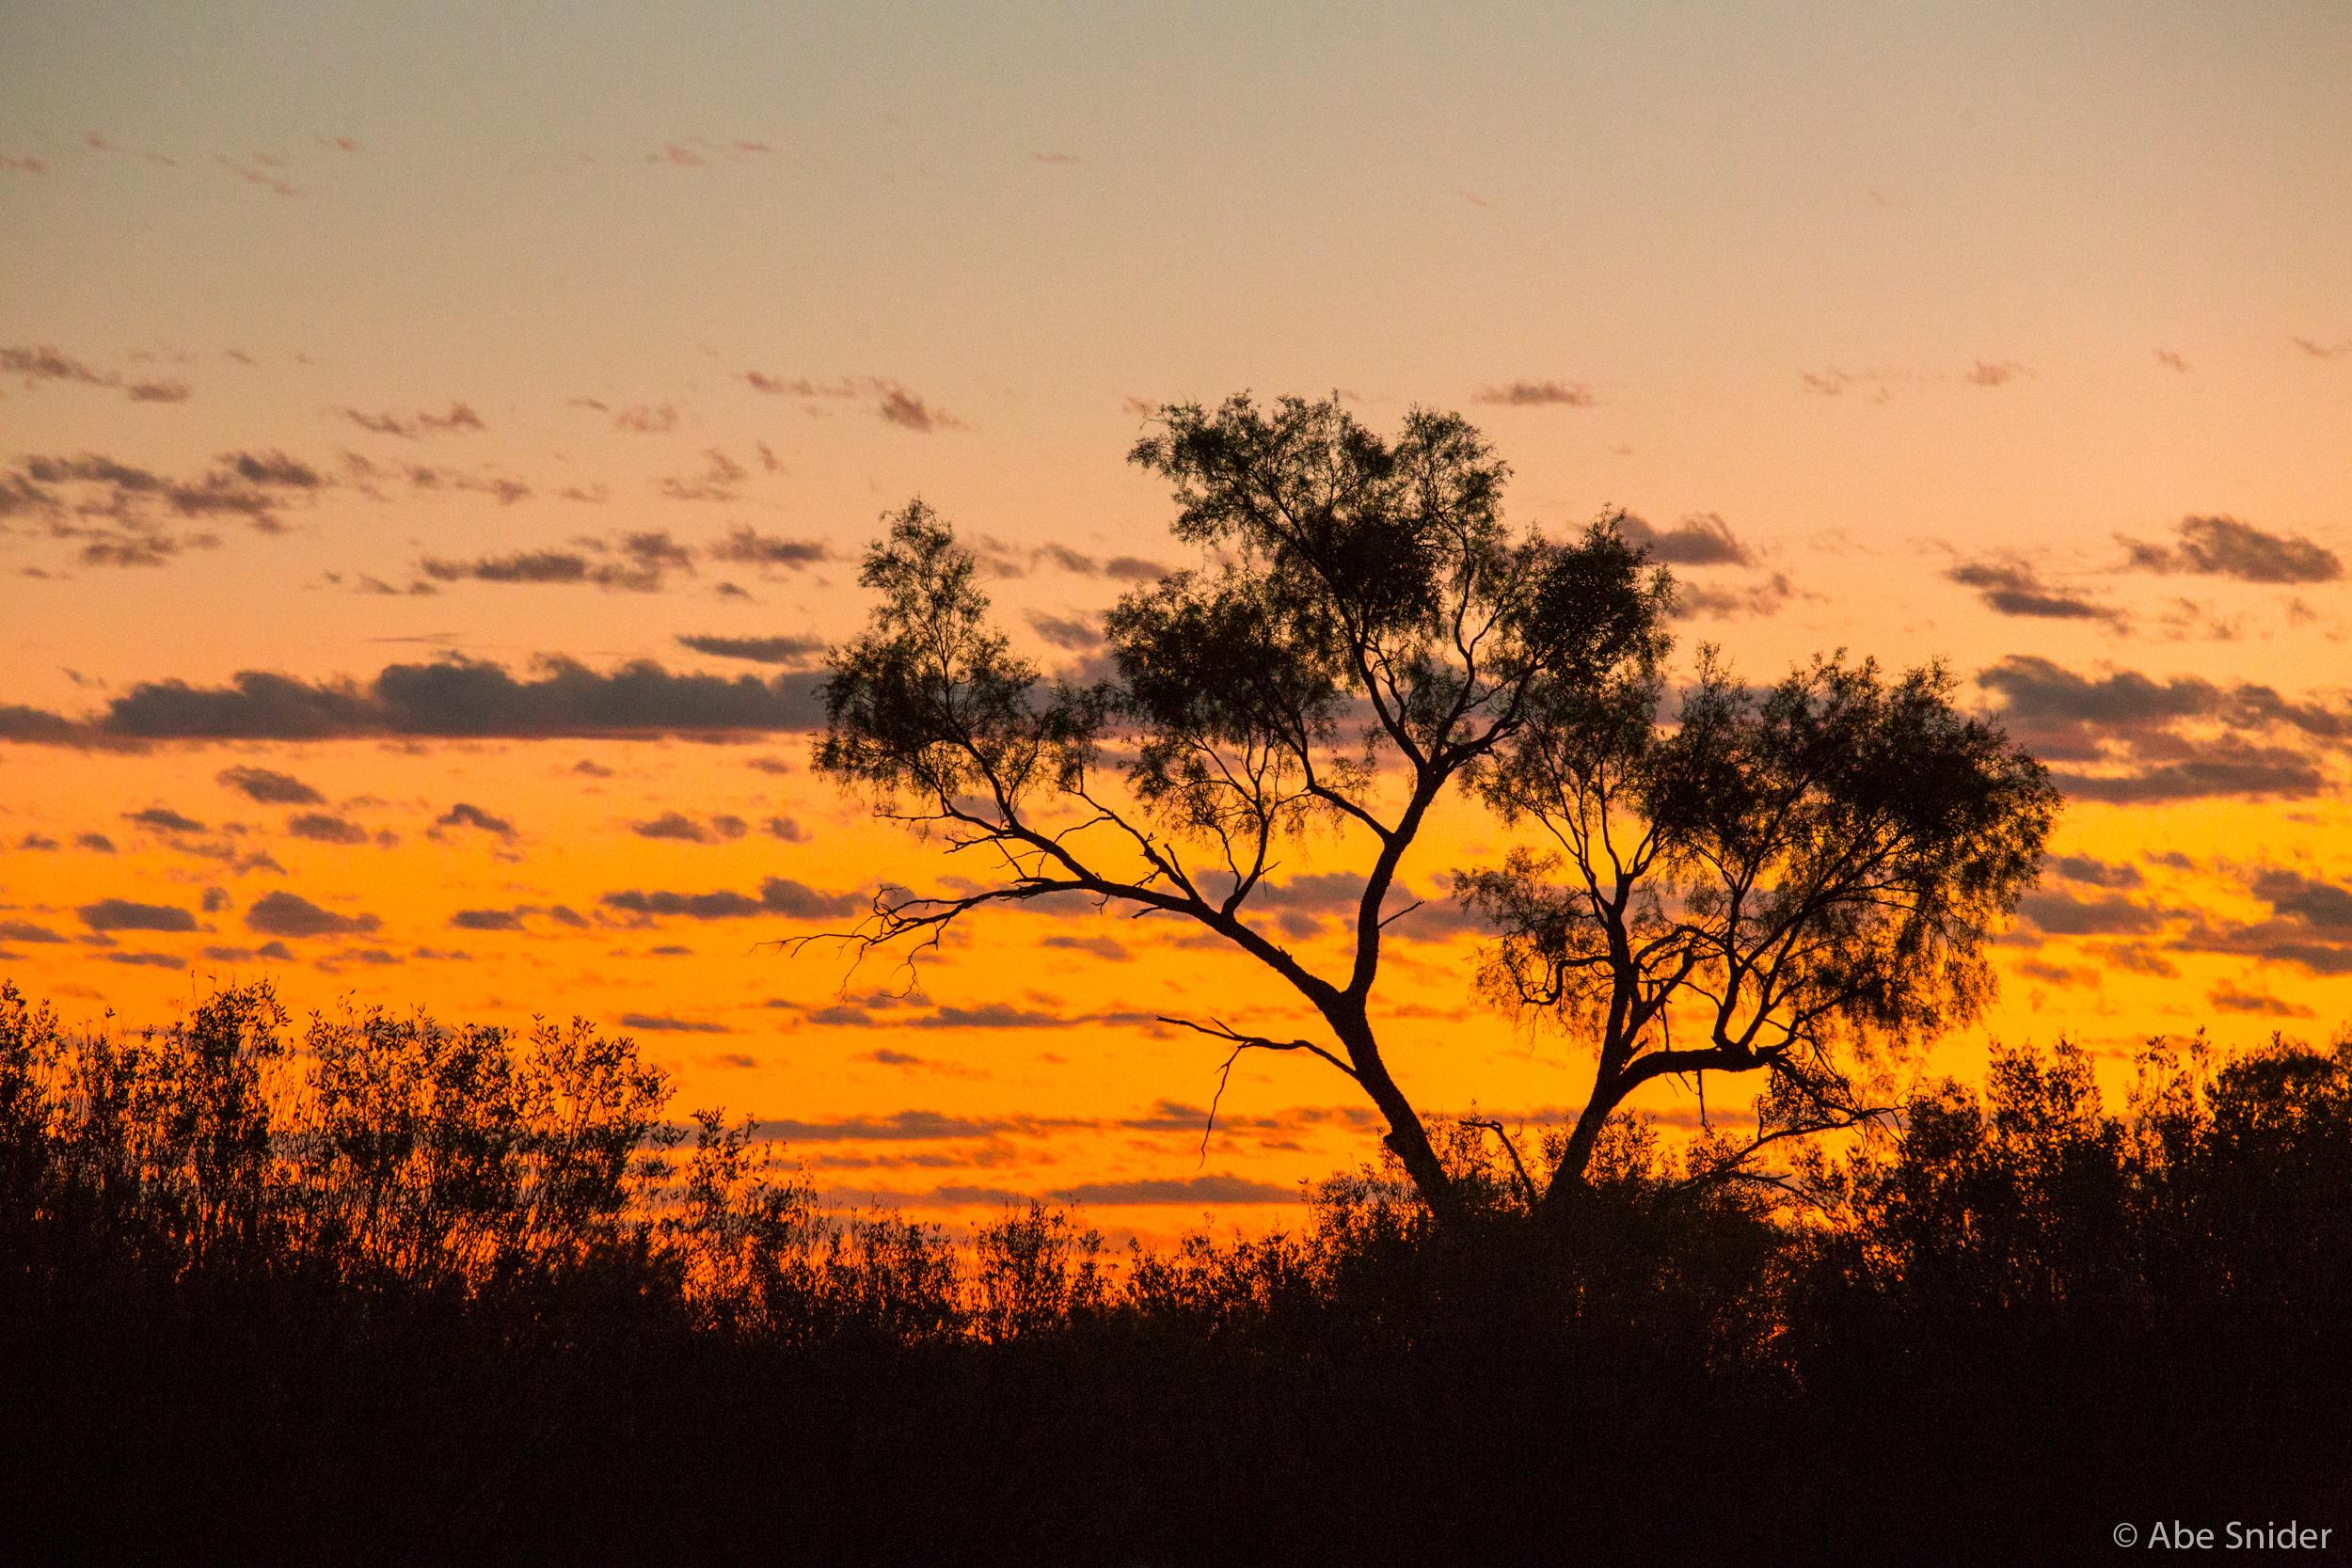 One of the ironwood trees in the Kangaroo Sanctuary.